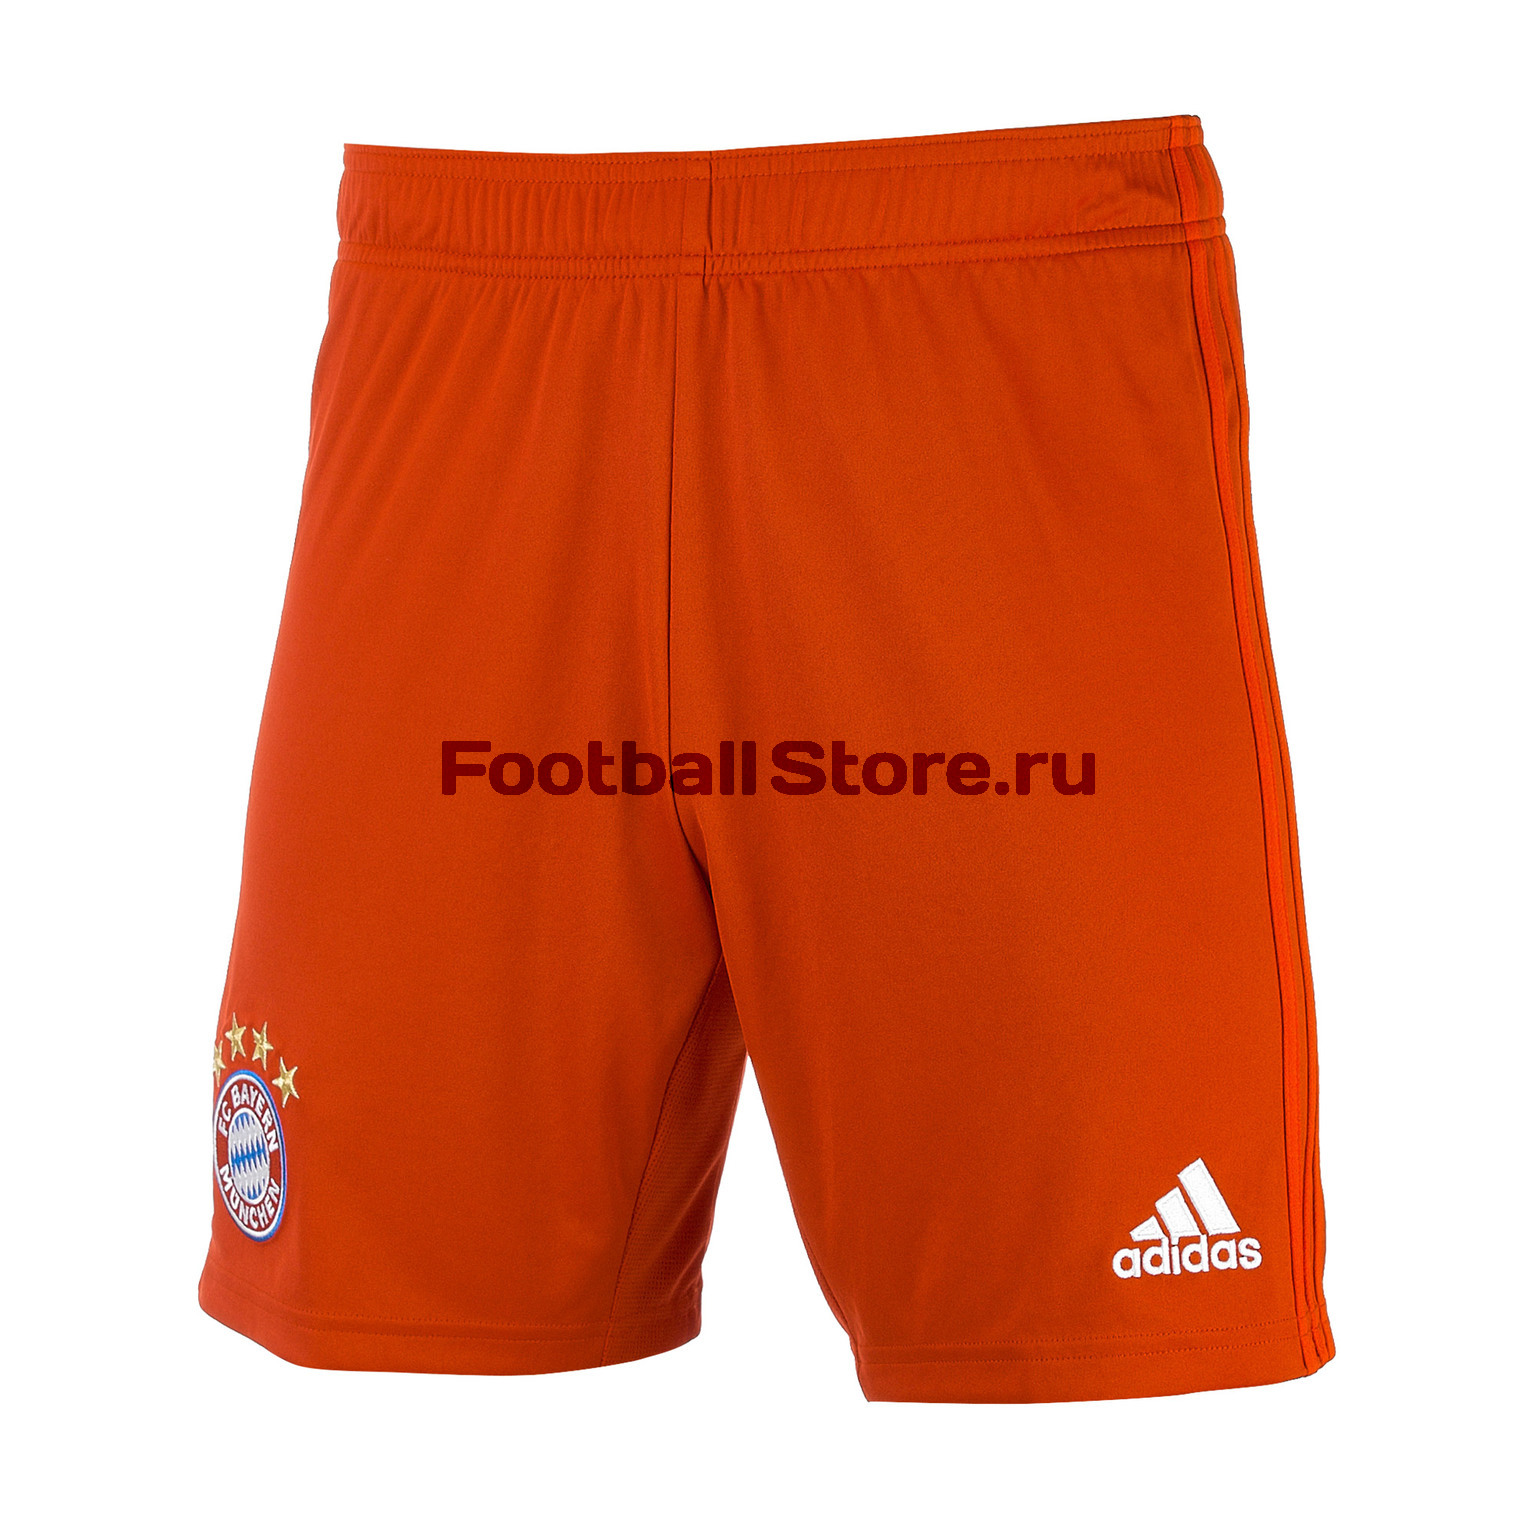 Шорты домашние Adidas Bayern 2019/20